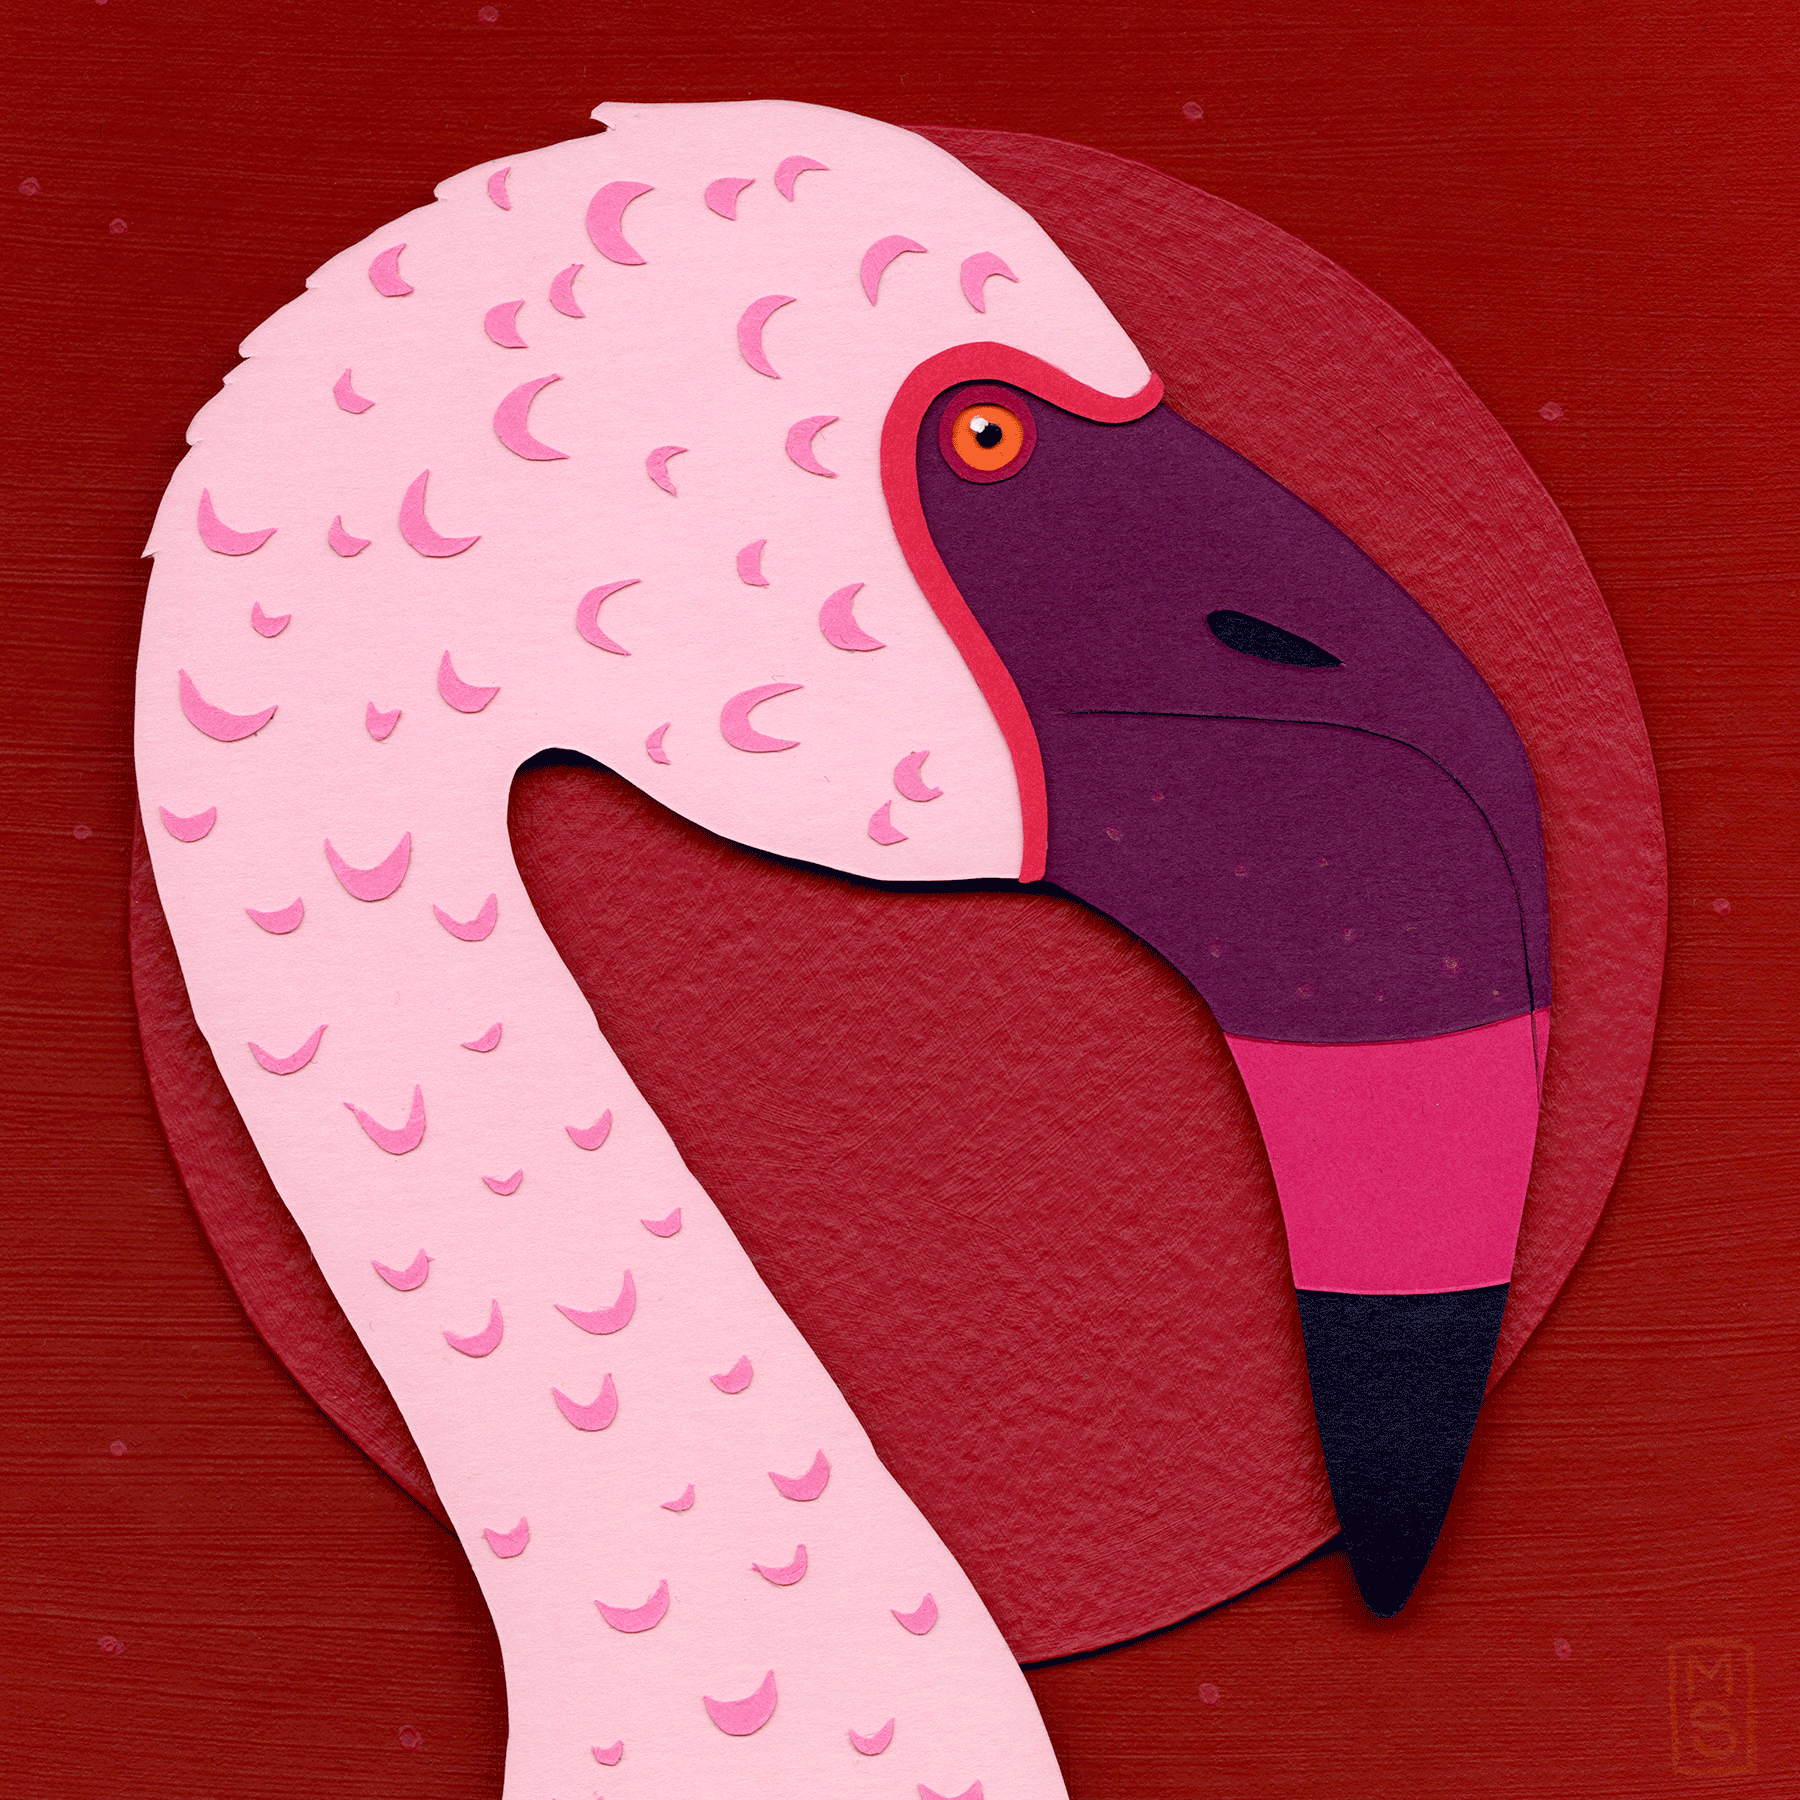 Flamingo_sRGB.png